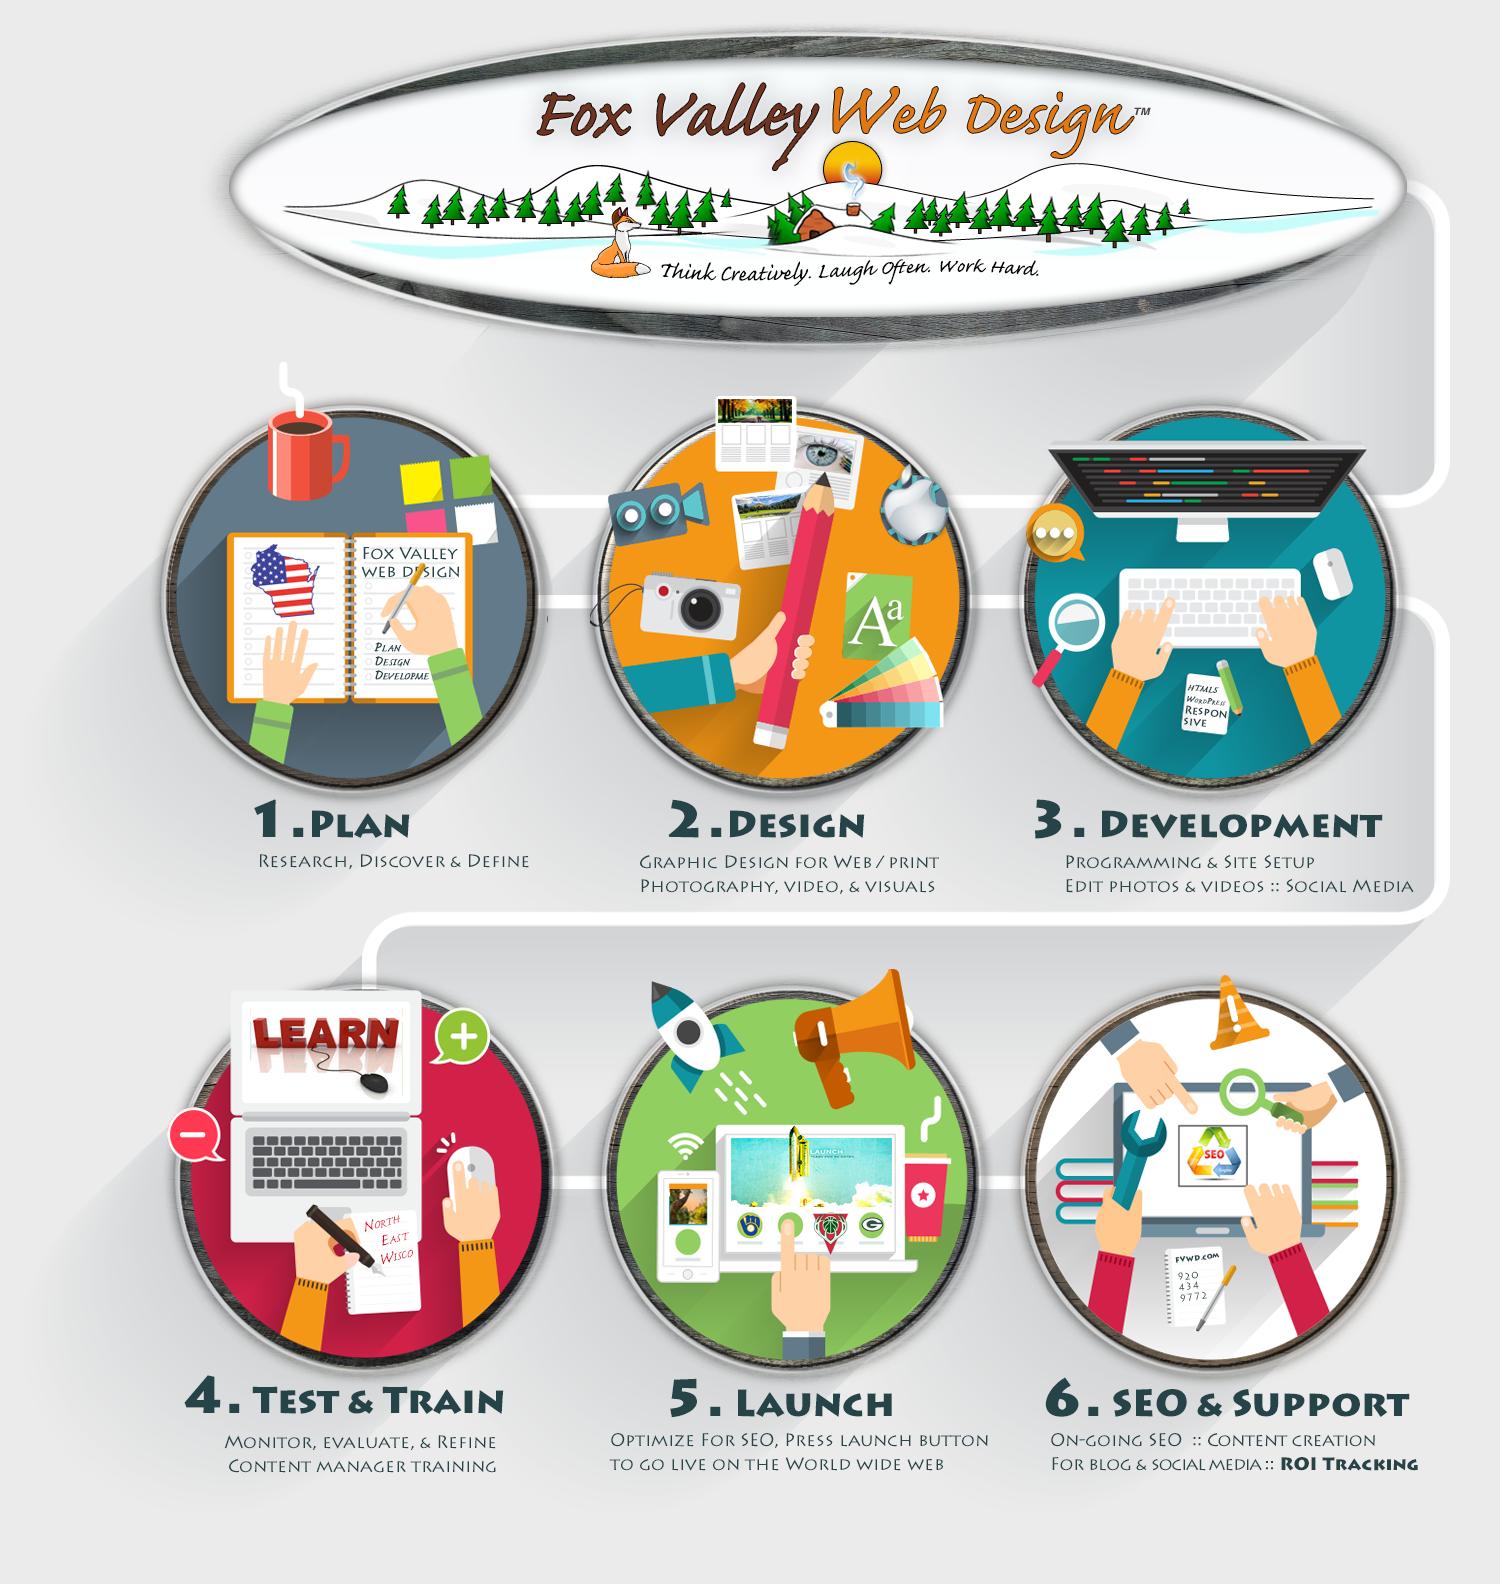 Wisconsin Website Design & Development - Fox Valley Web Design LLC